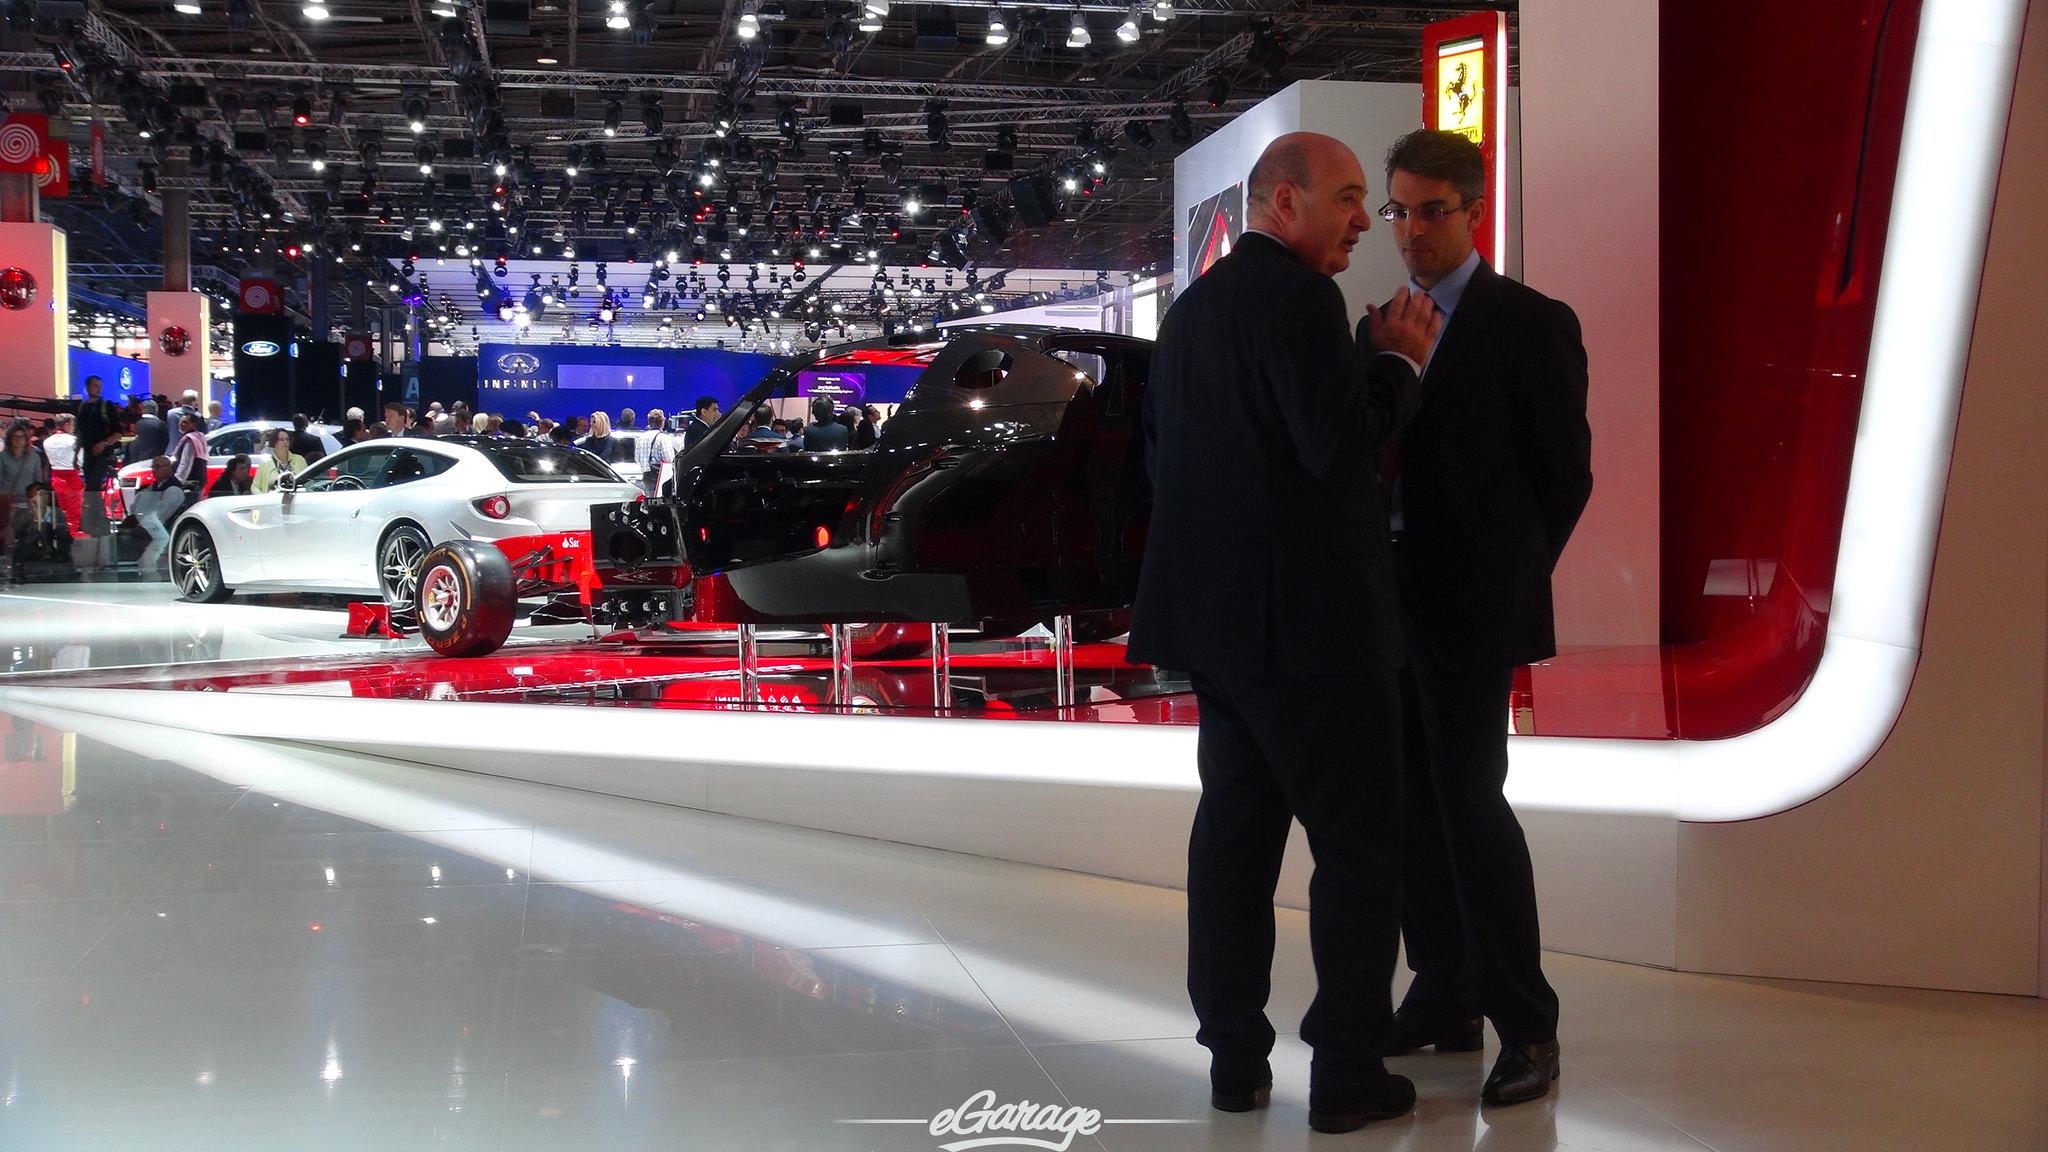 8034739668 fea5bc8f56 k 2012 Paris Motor Show